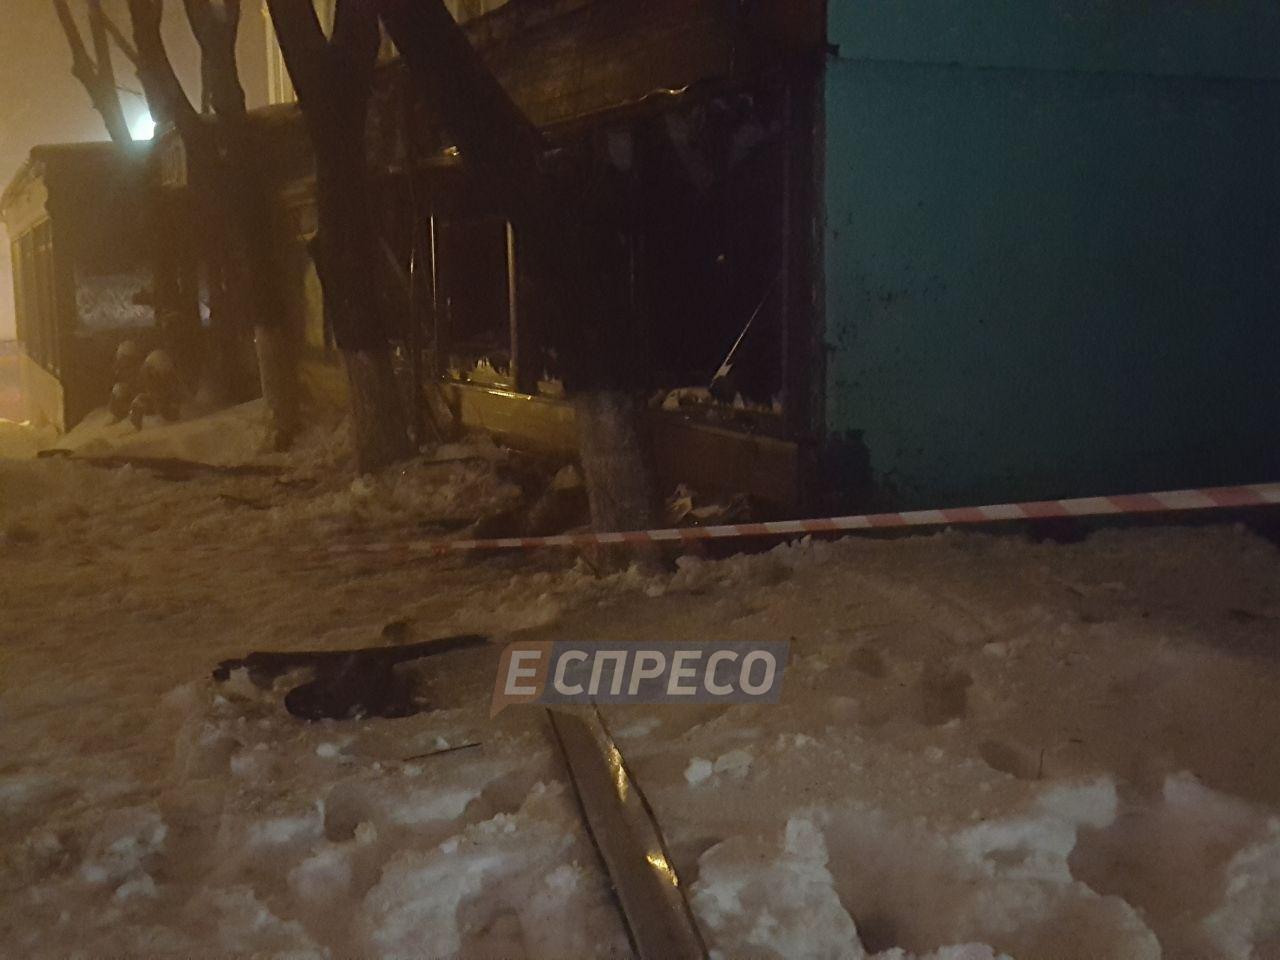 В Киеве из гранатомета расстреляли ресторан (ФОТО), фото-1